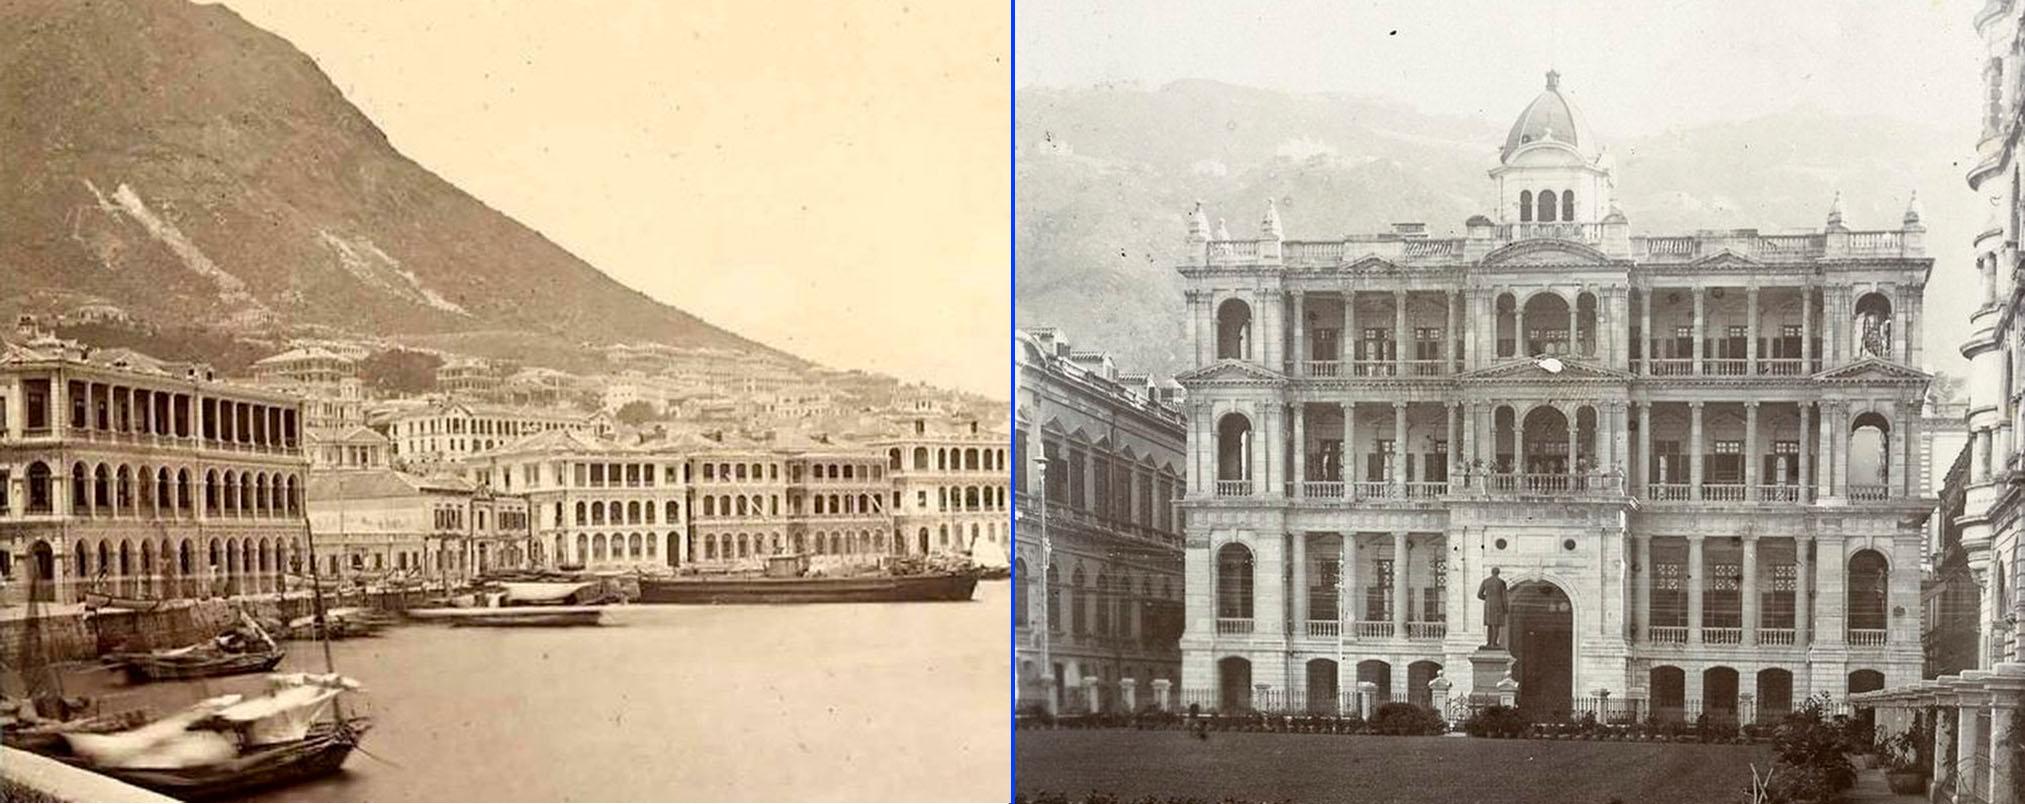 Puerto de Hong Kong y primera sede del HSBC en China